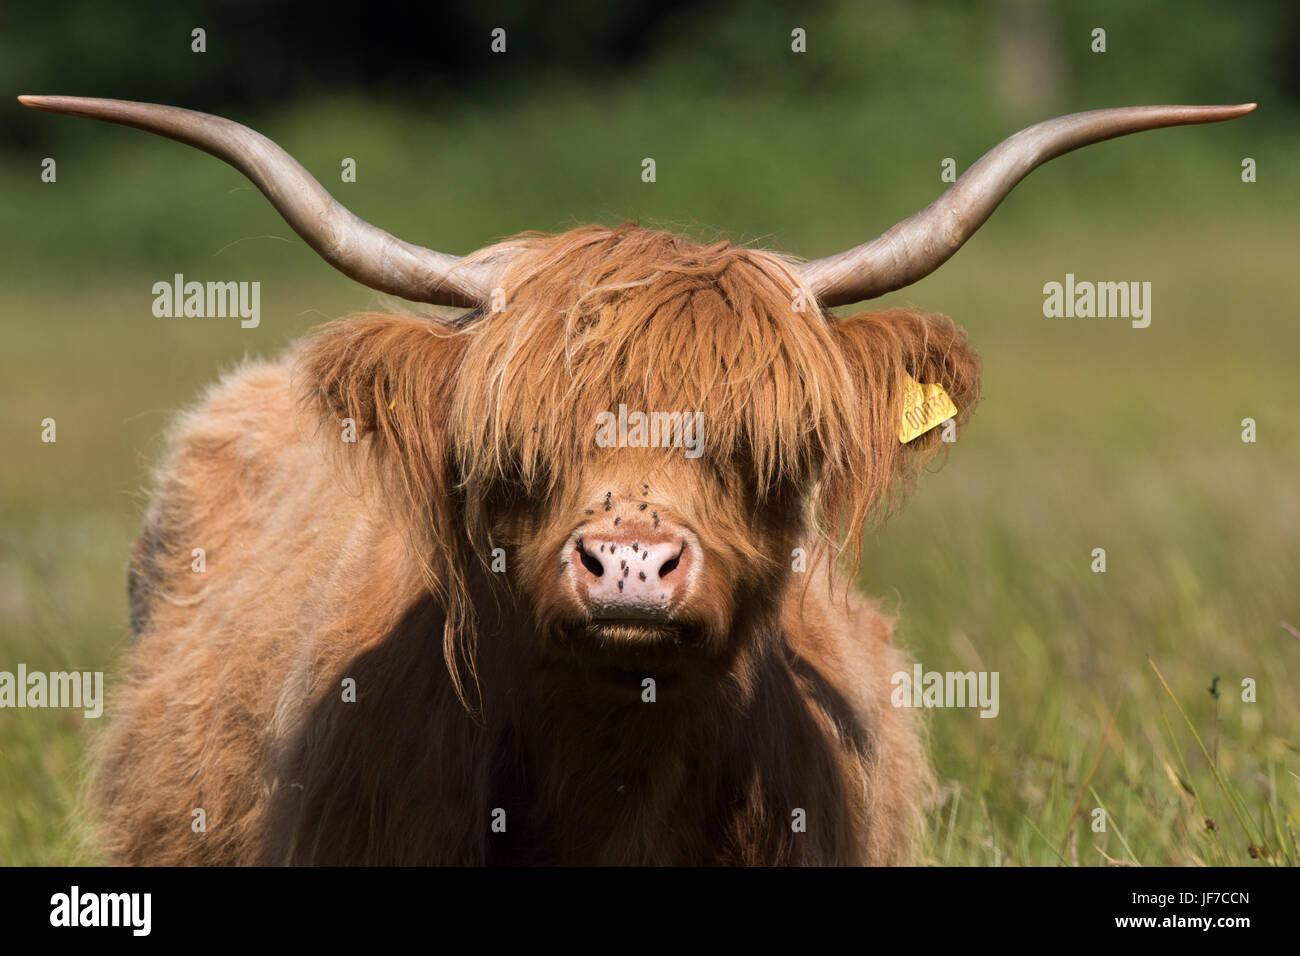 Kopfschuss eine Highland-Kuh (Bos Taurus) Stockbild